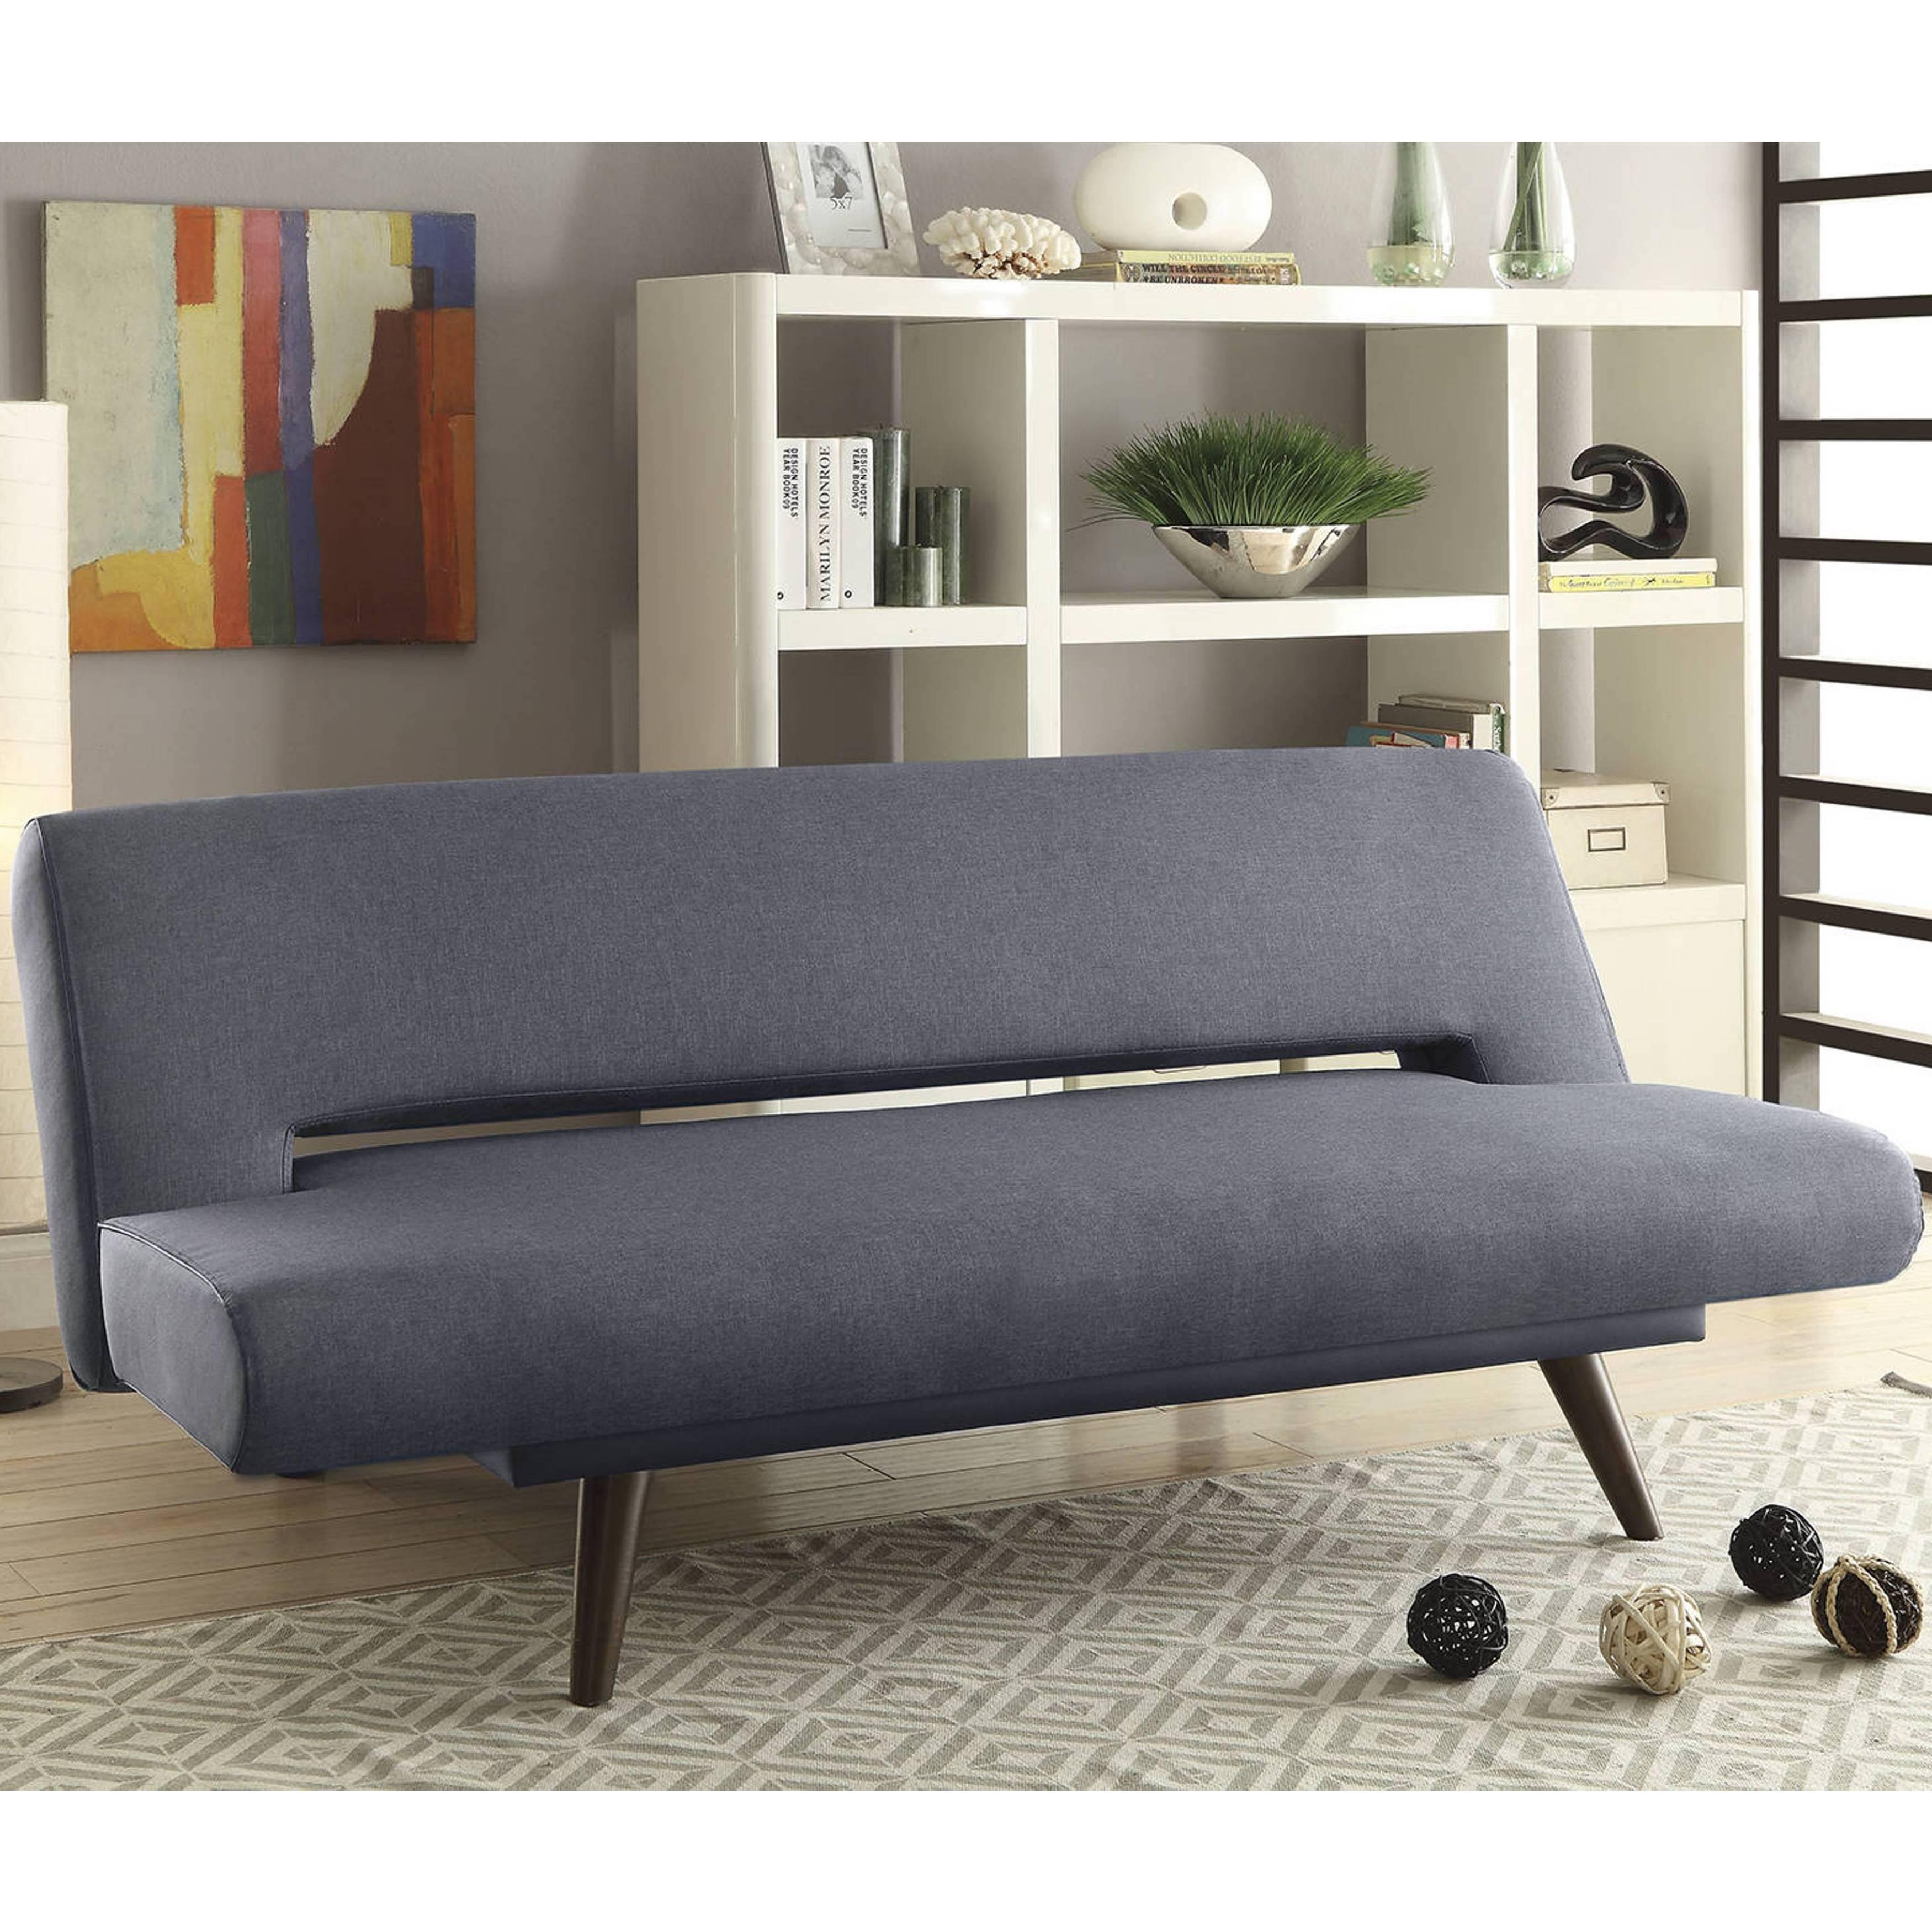 Shop Modern Design Convertible Sofa Bed - Free Shipping Today ...